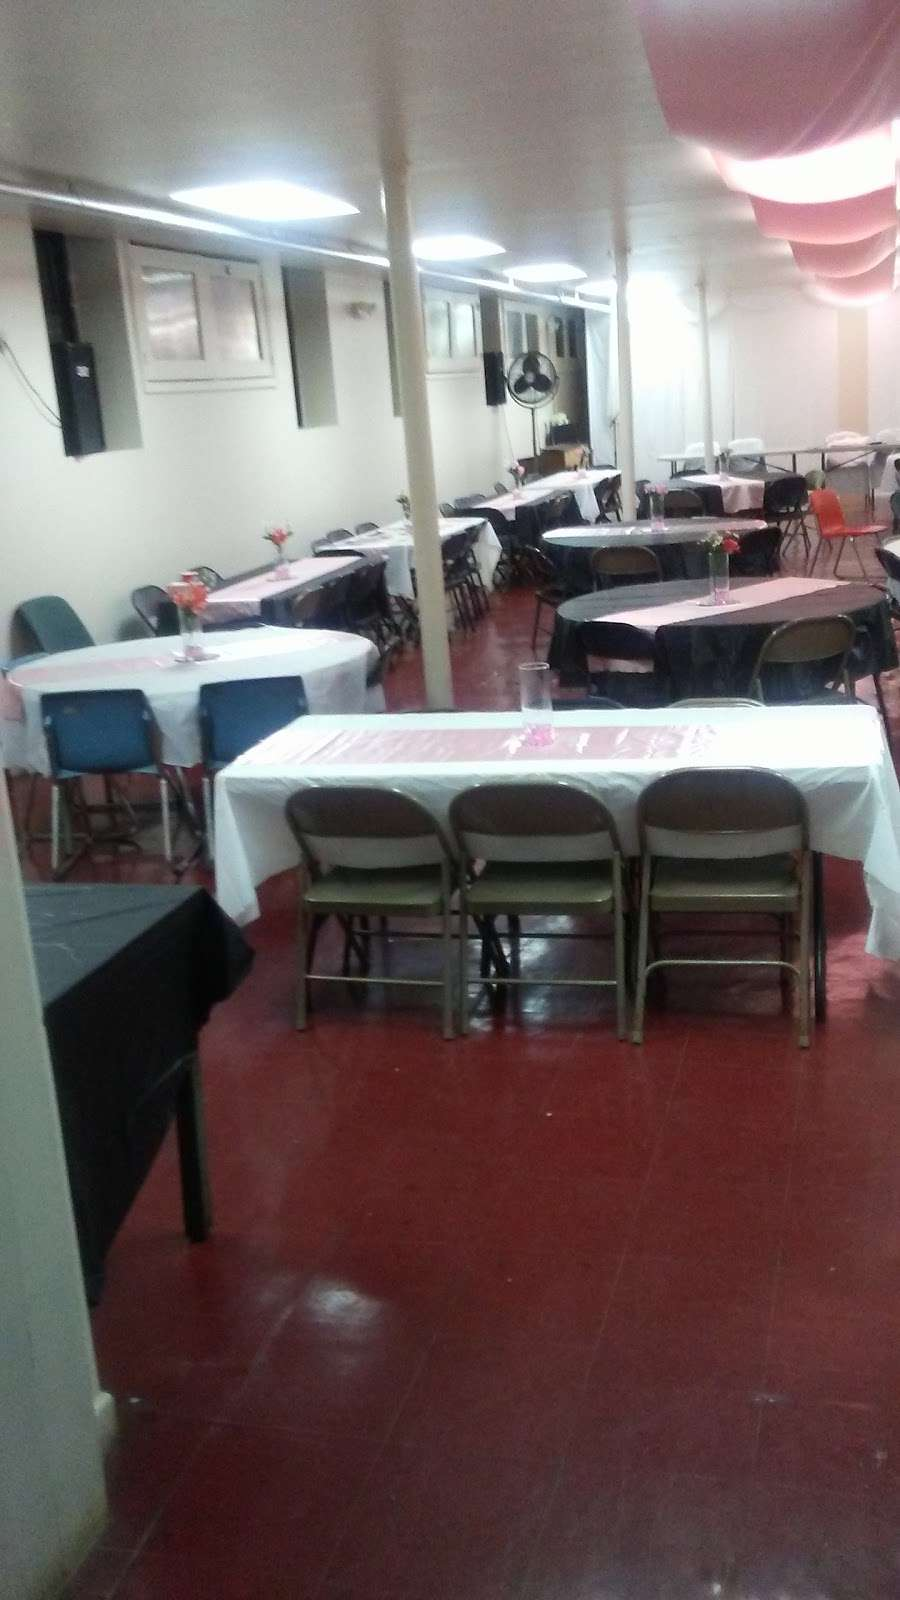 First Calvary Baptist Church - church    Photo 3 of 6   Address: 953 Putnam Ave, Brooklyn, NY 11221, USA   Phone: (718) 453-1278